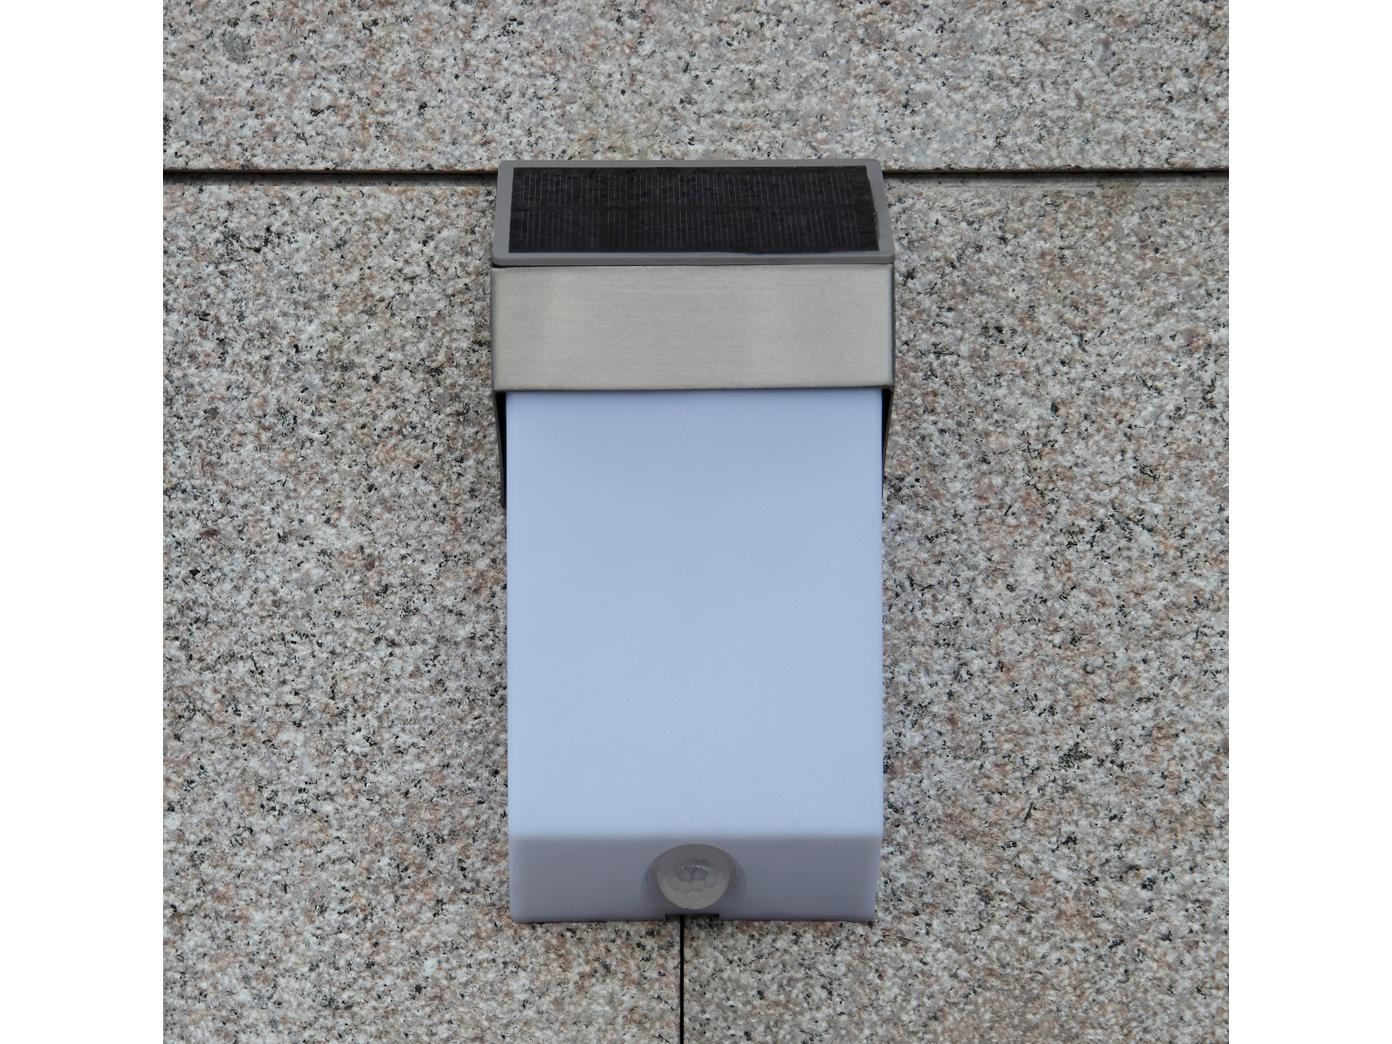 LED-Ausenwandleuchte-mit-Solar-Bewegungsmelder-Hausnummern-IP44-Wandleuchten miniatura 6